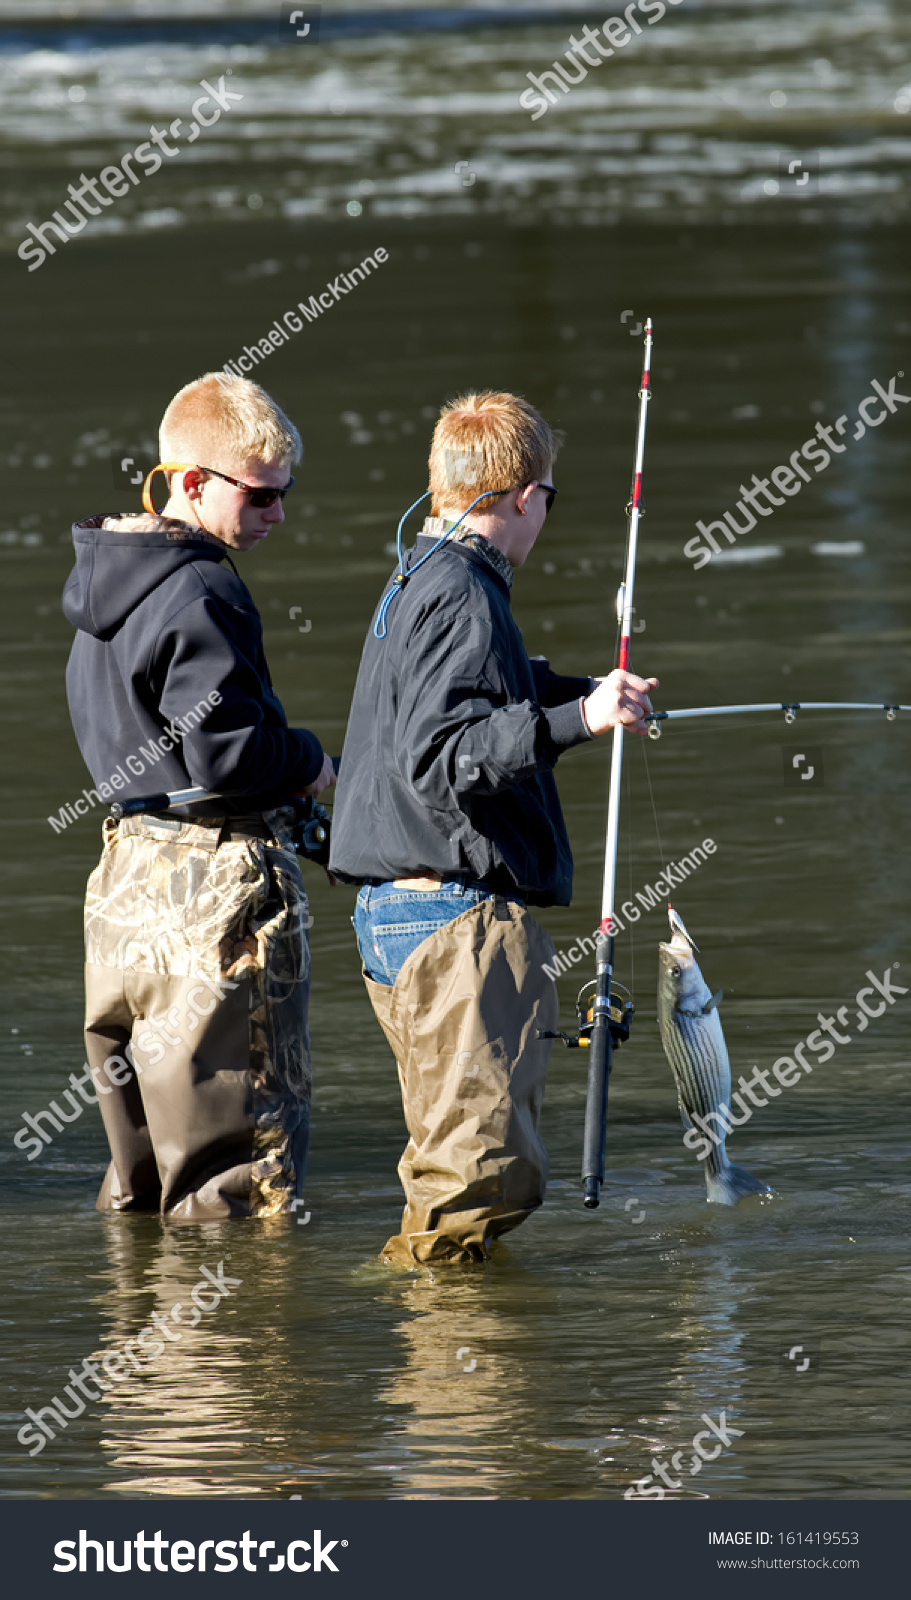 Conowingo dam md november 3 2013 striped bass fishing for Peak fishing times